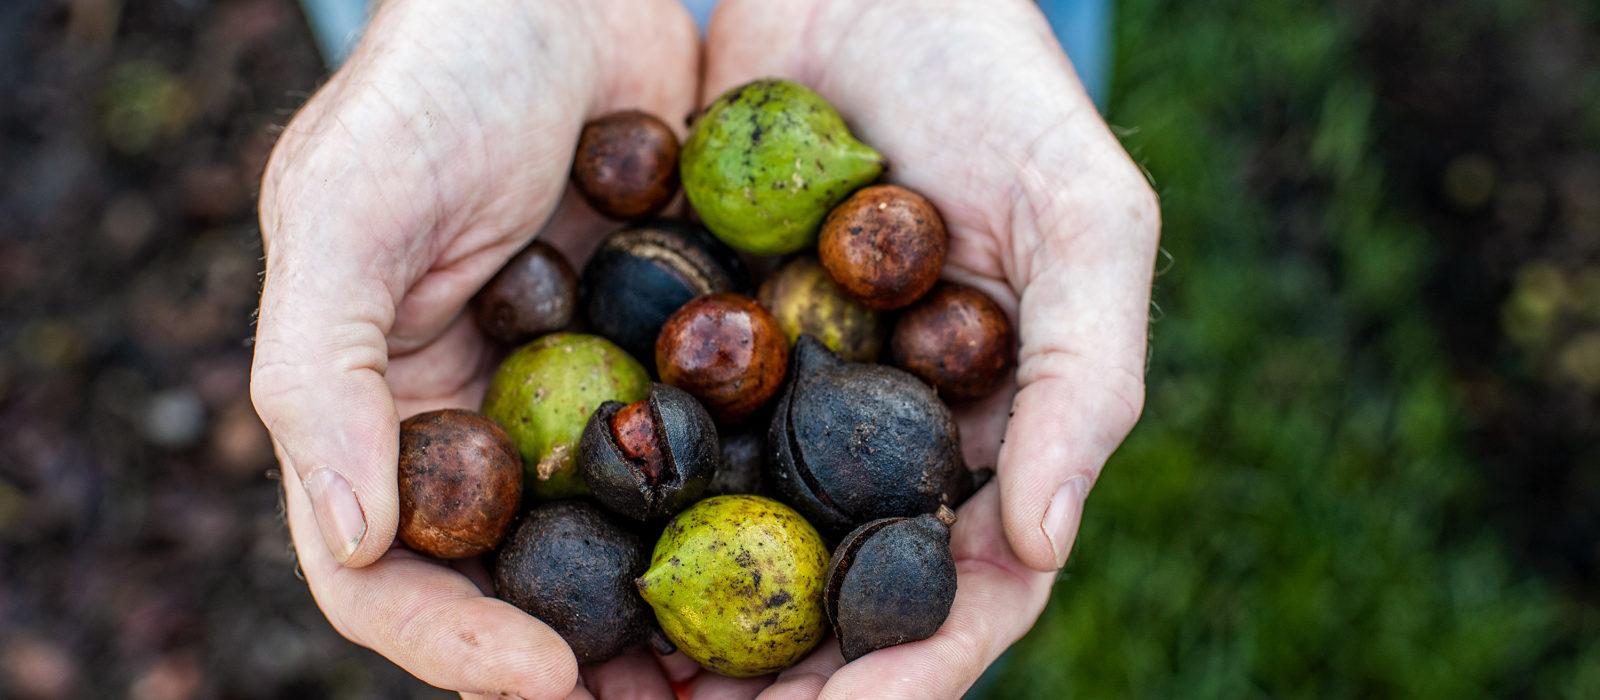 Closeup of hands holding macadamia nuts